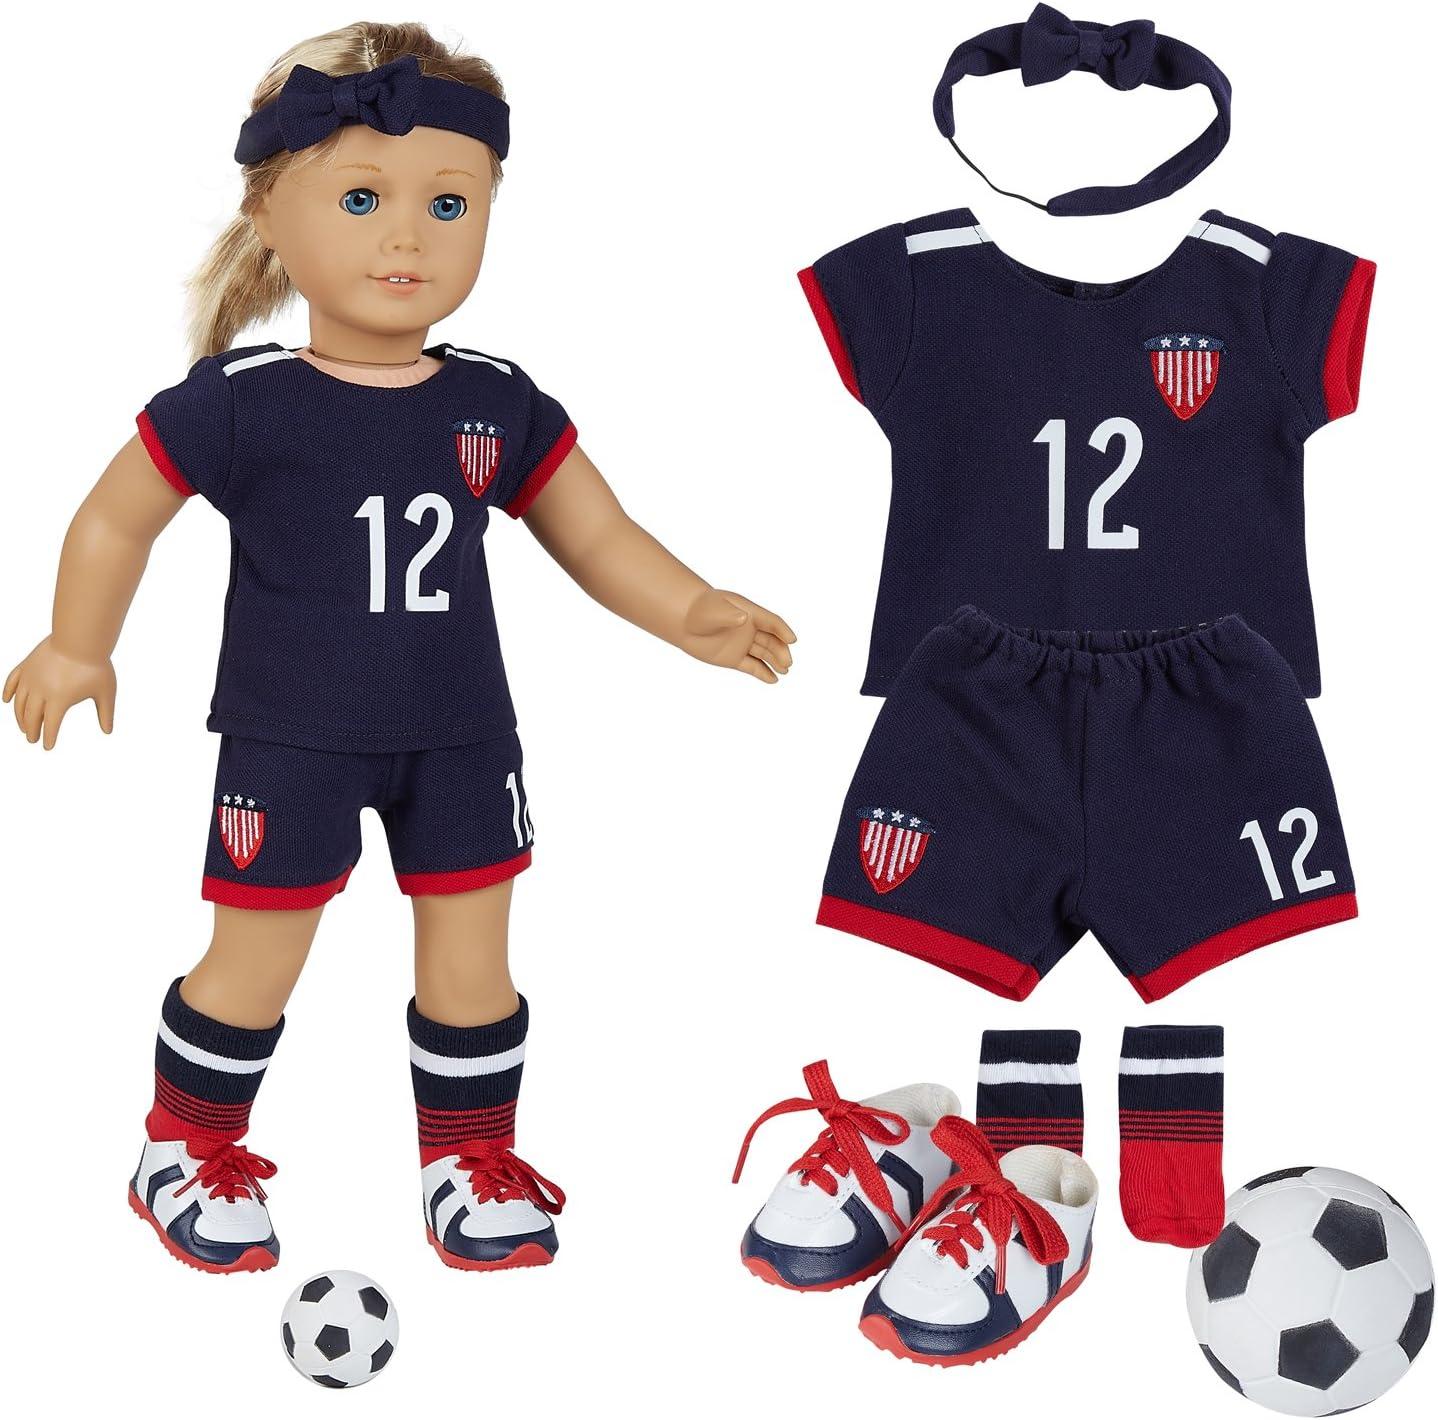 Soccer Ball  Doll  Accessory  for 18/'/' Dolls by American Fashion World